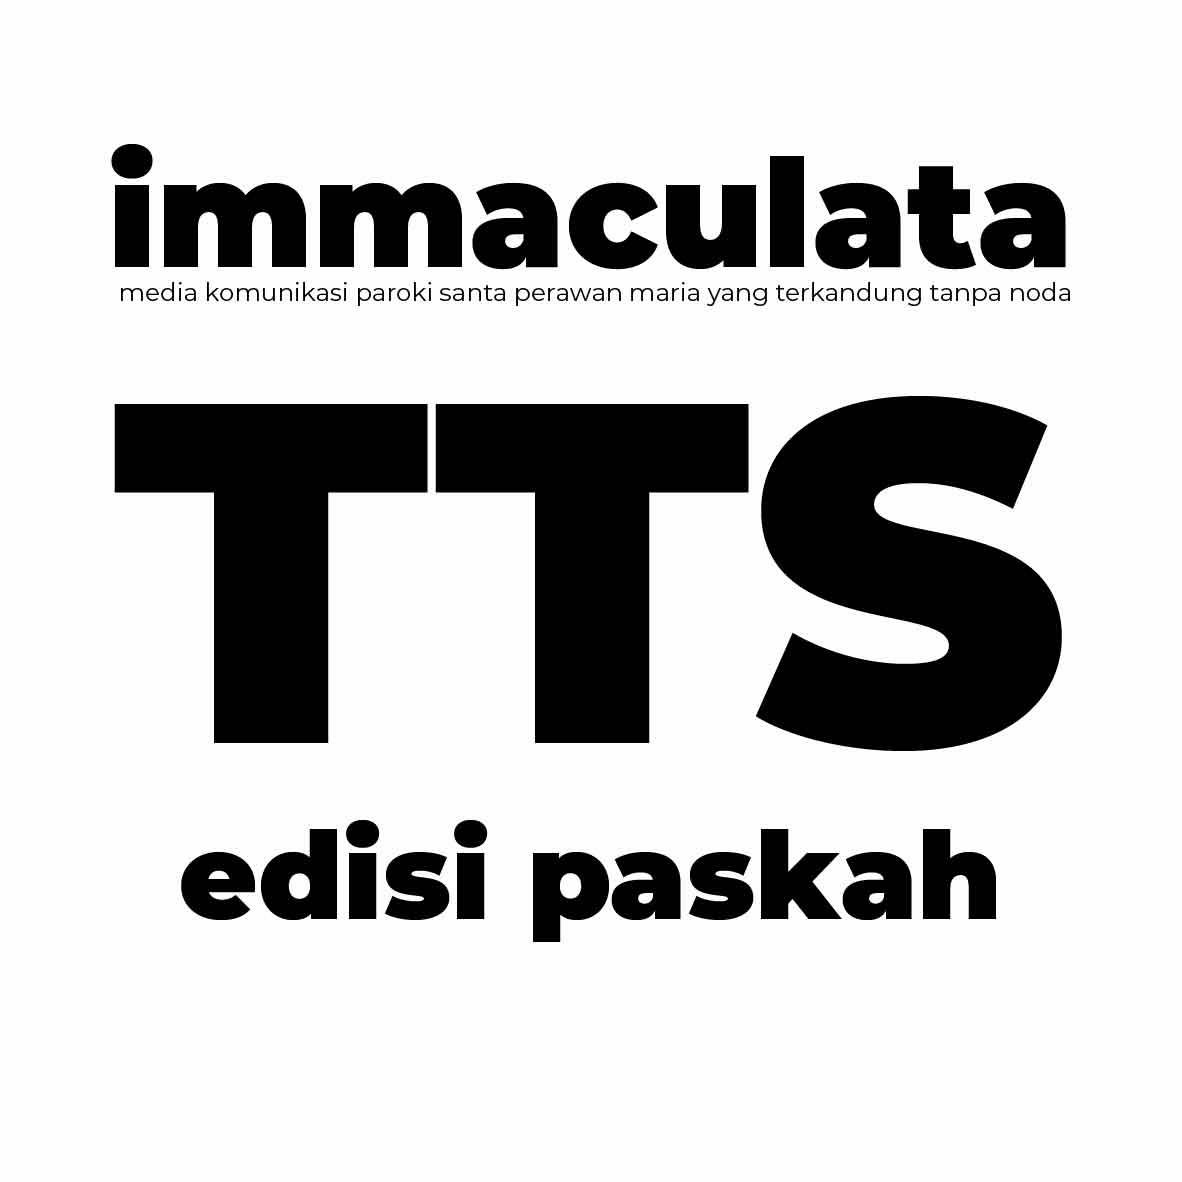 Teka Teki Silang (TTS) Buletin Immaculata edisi Paskah